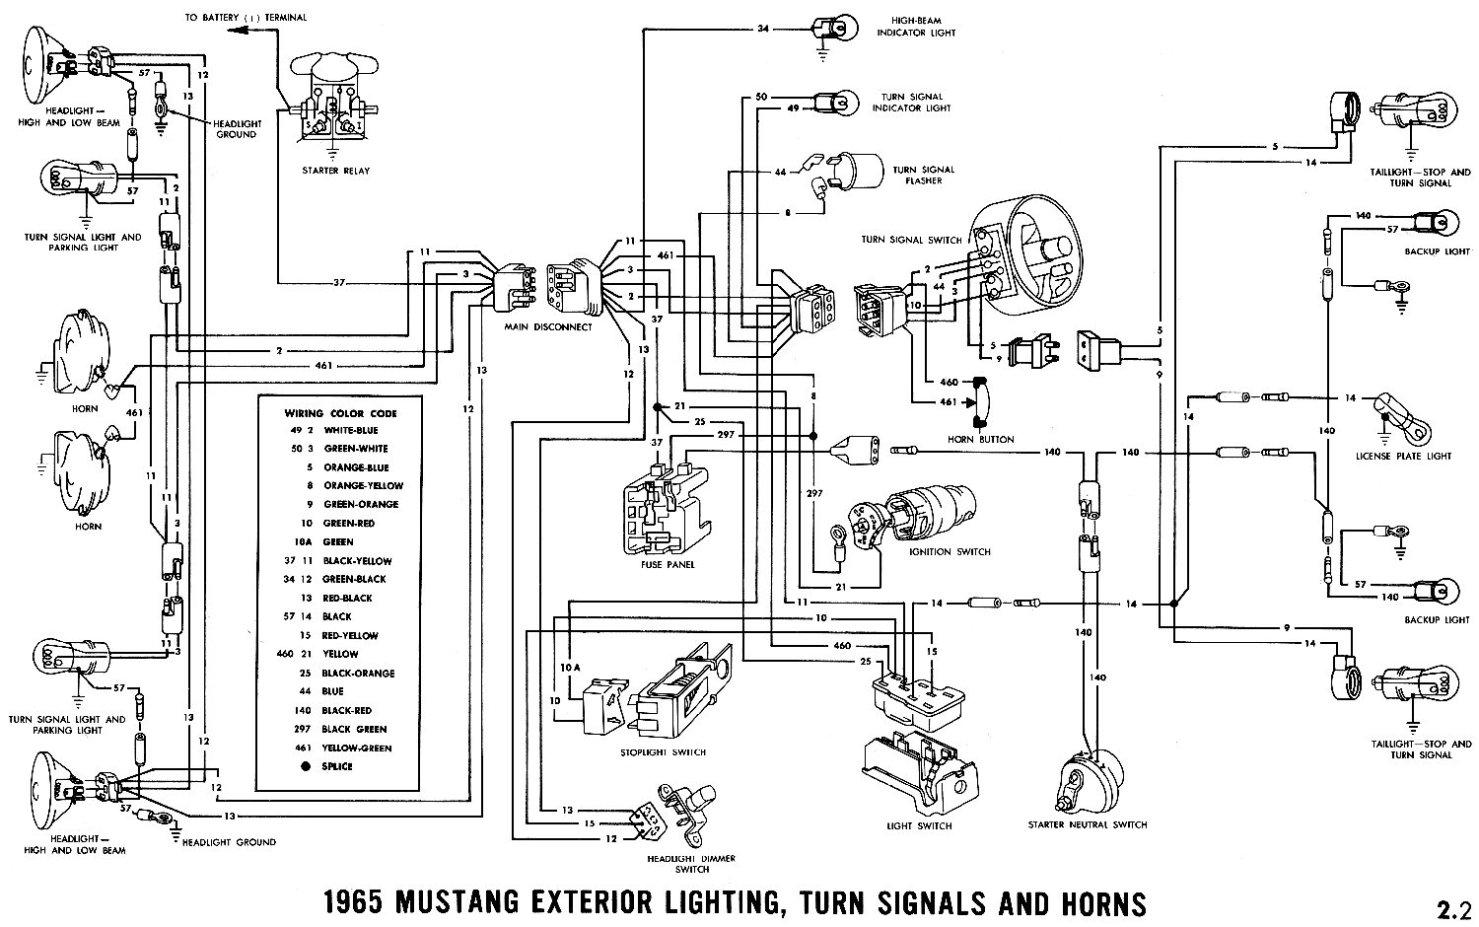 Pleasant 1990 Mustang Wiring Diagram F Wiring Diagram Wiring Diagrams Mustang Wiring Cloud Hisonepsysticxongrecoveryedborg